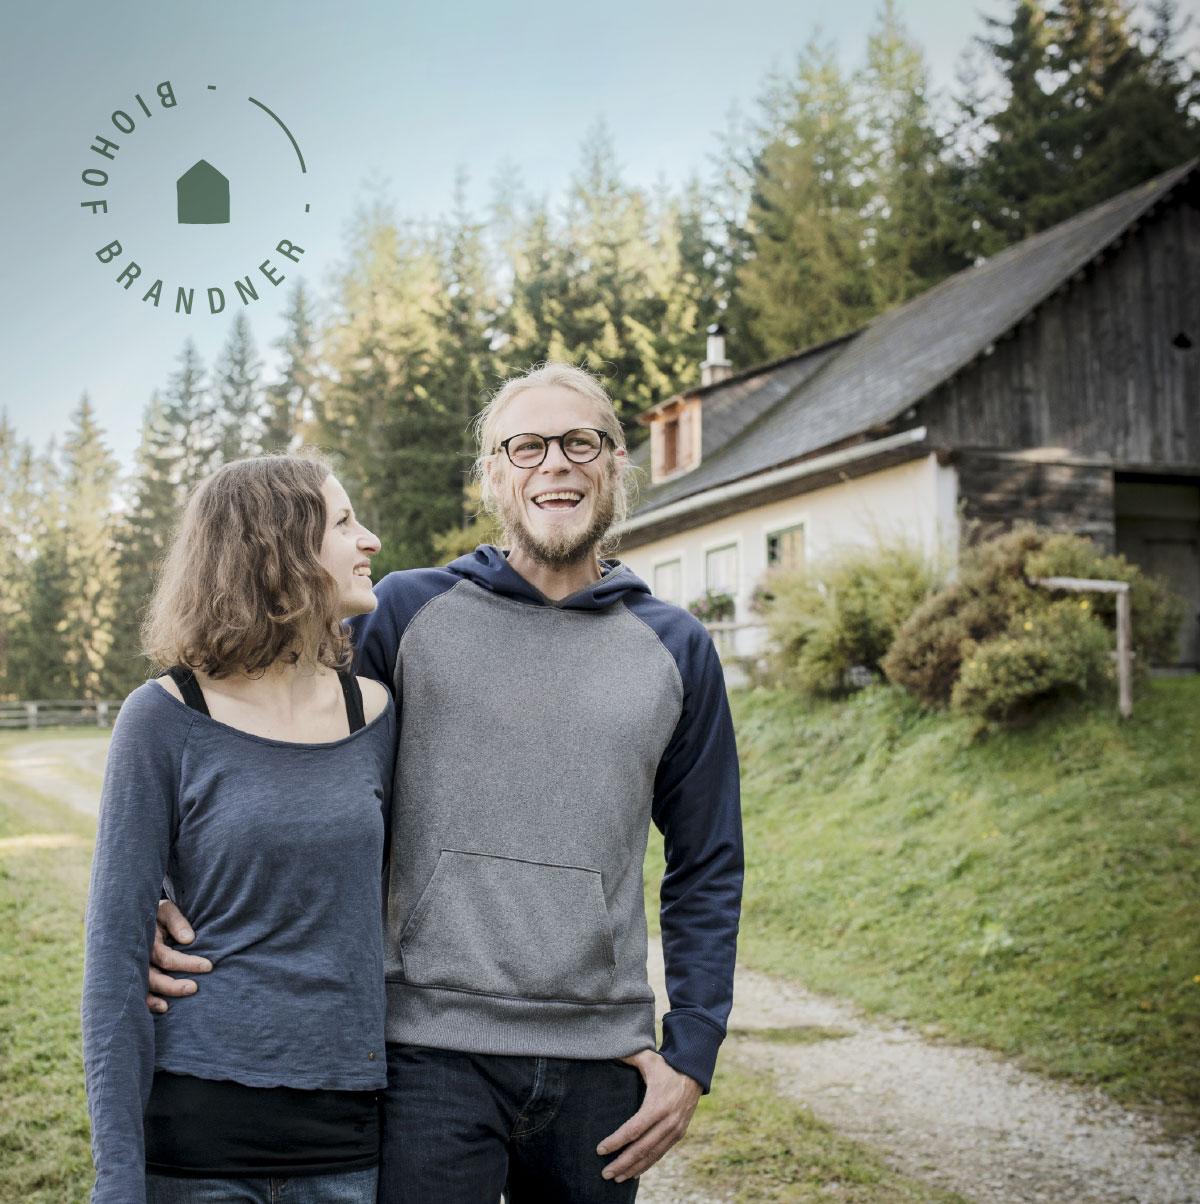 Urlaub am Biohof Brandner Steiermark